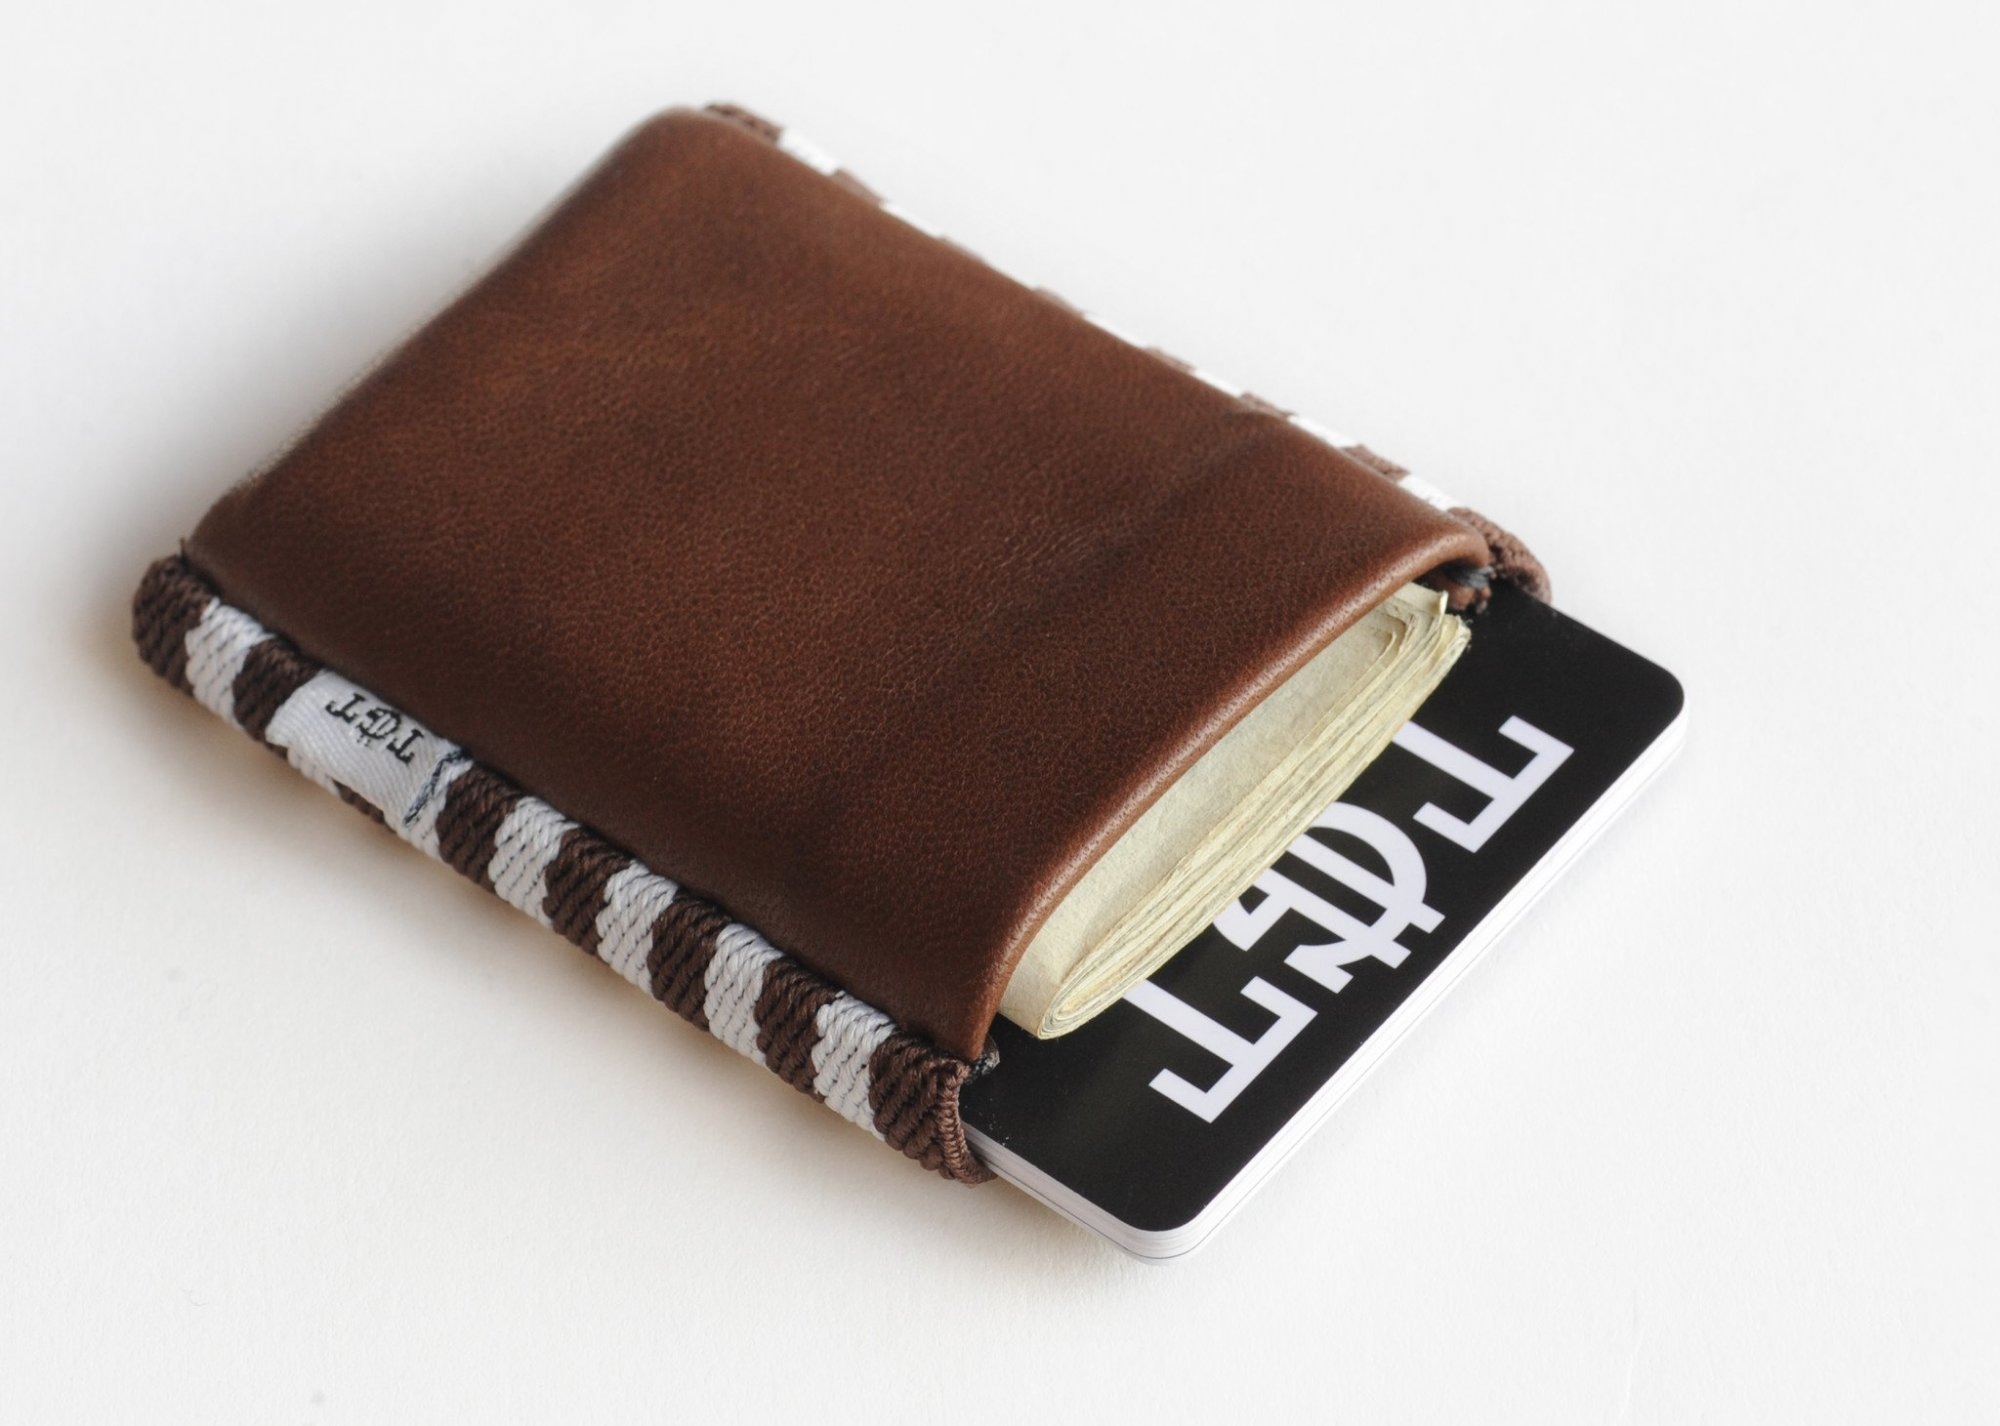 Cowman 2.0 Wallet